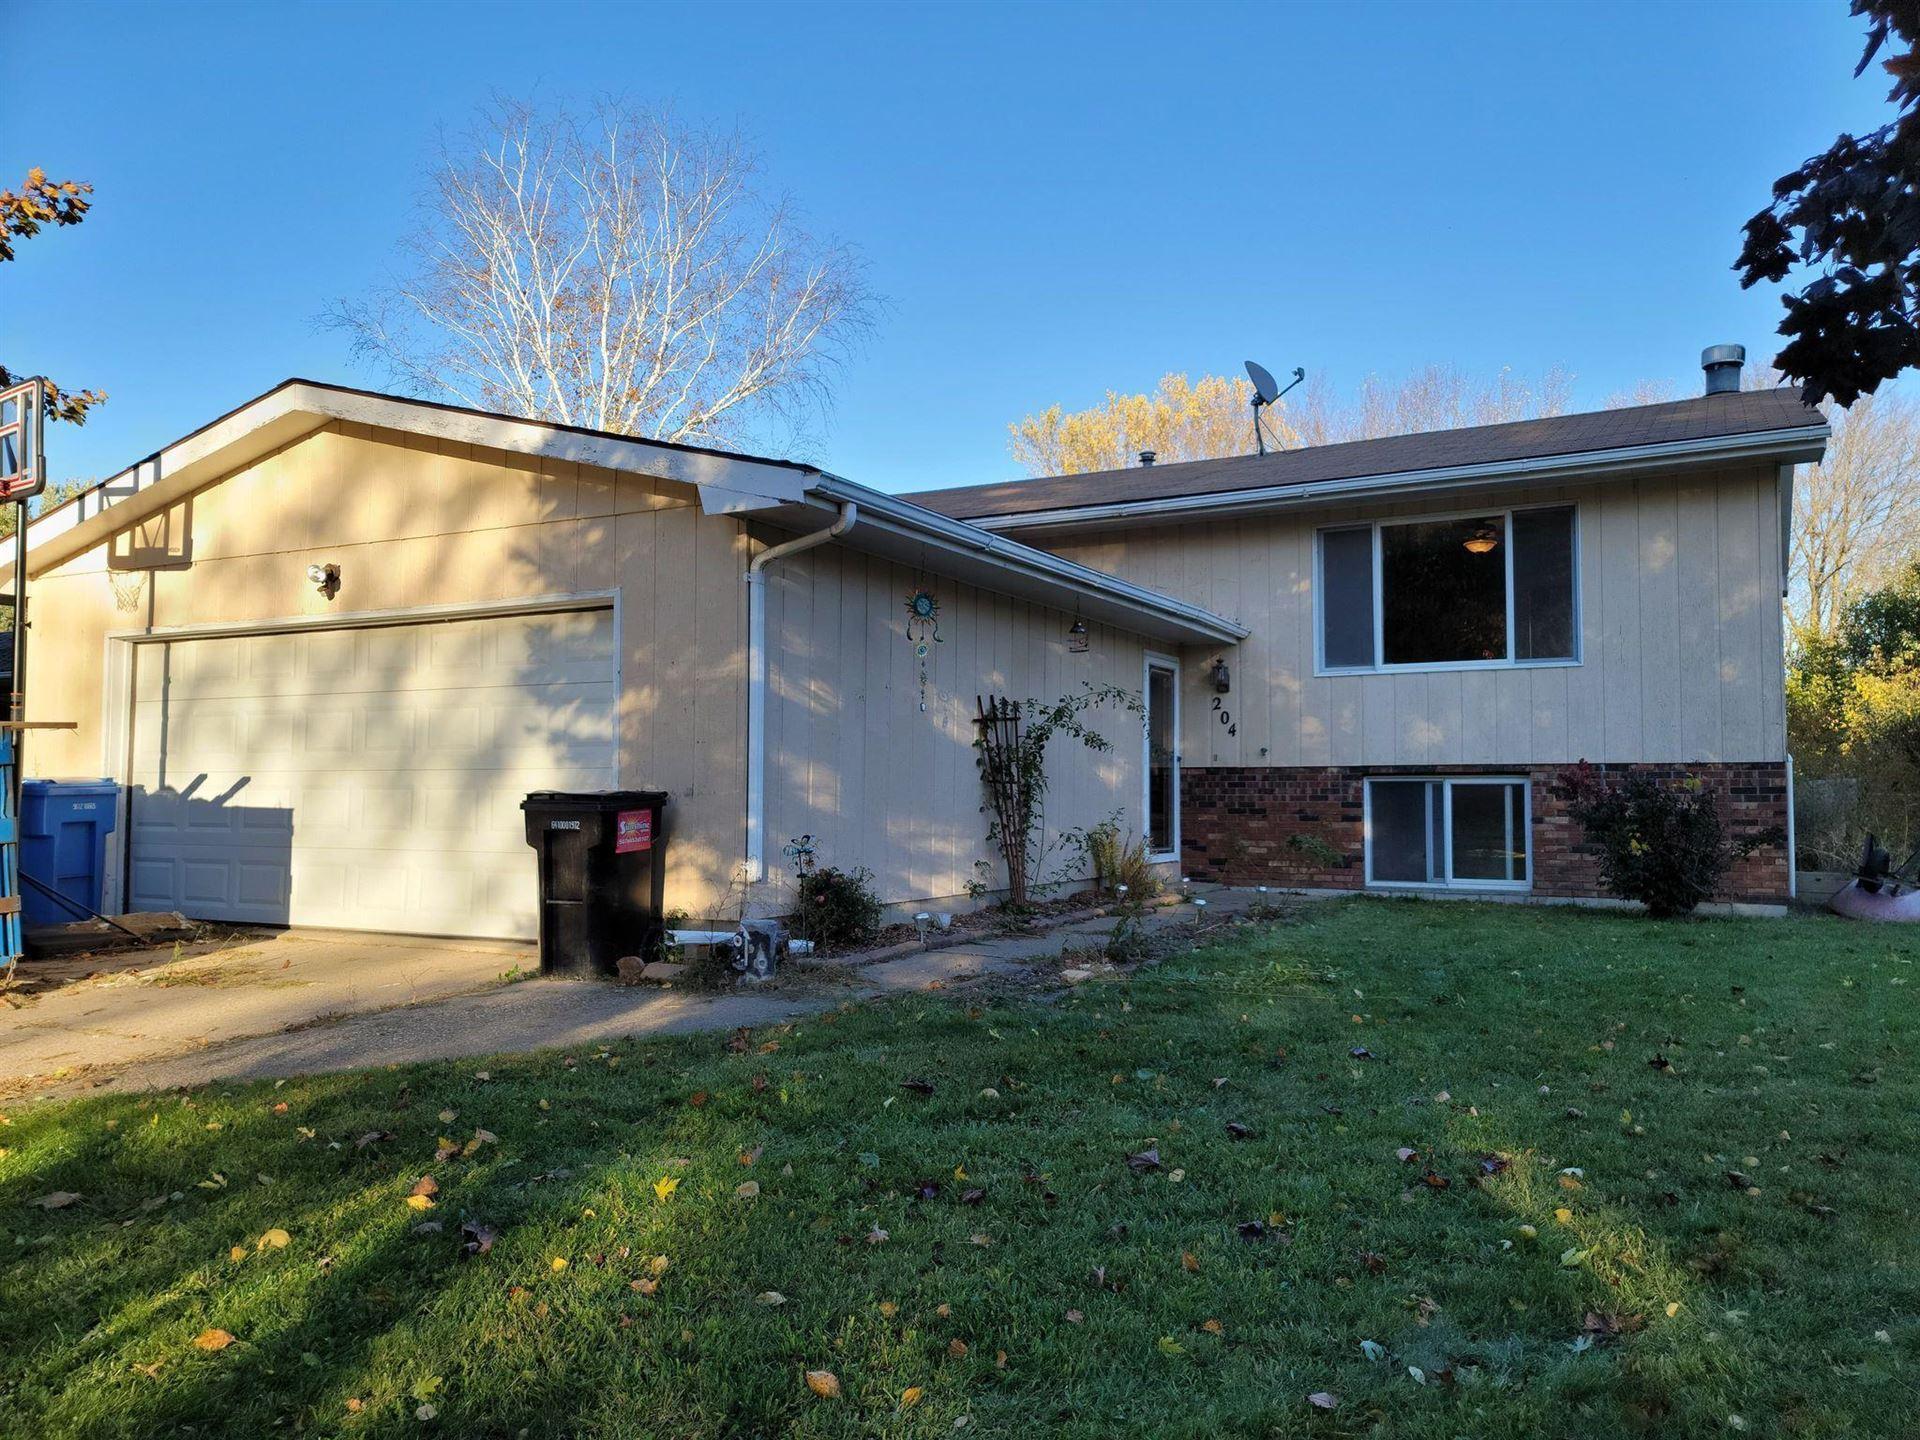 204 Edgeview Drive, Rollingstone, MN 55969 - MLS#: 5673612